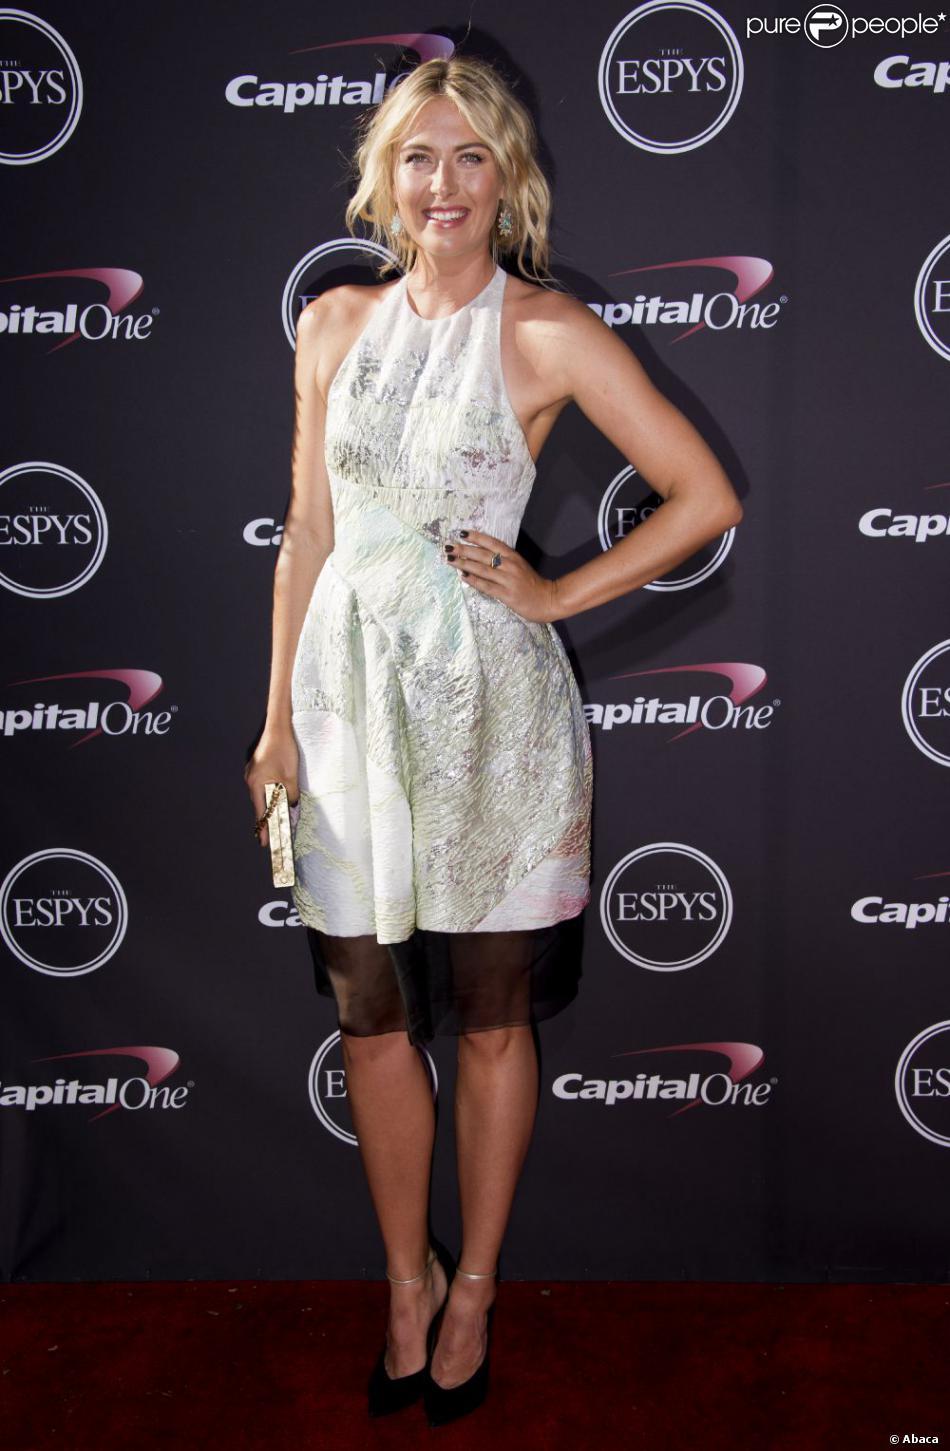 Maria Sharapova lors de la cérémonie des ESPY Awards au Nokia Theatre de Los Angeles le 17 juillet 2013